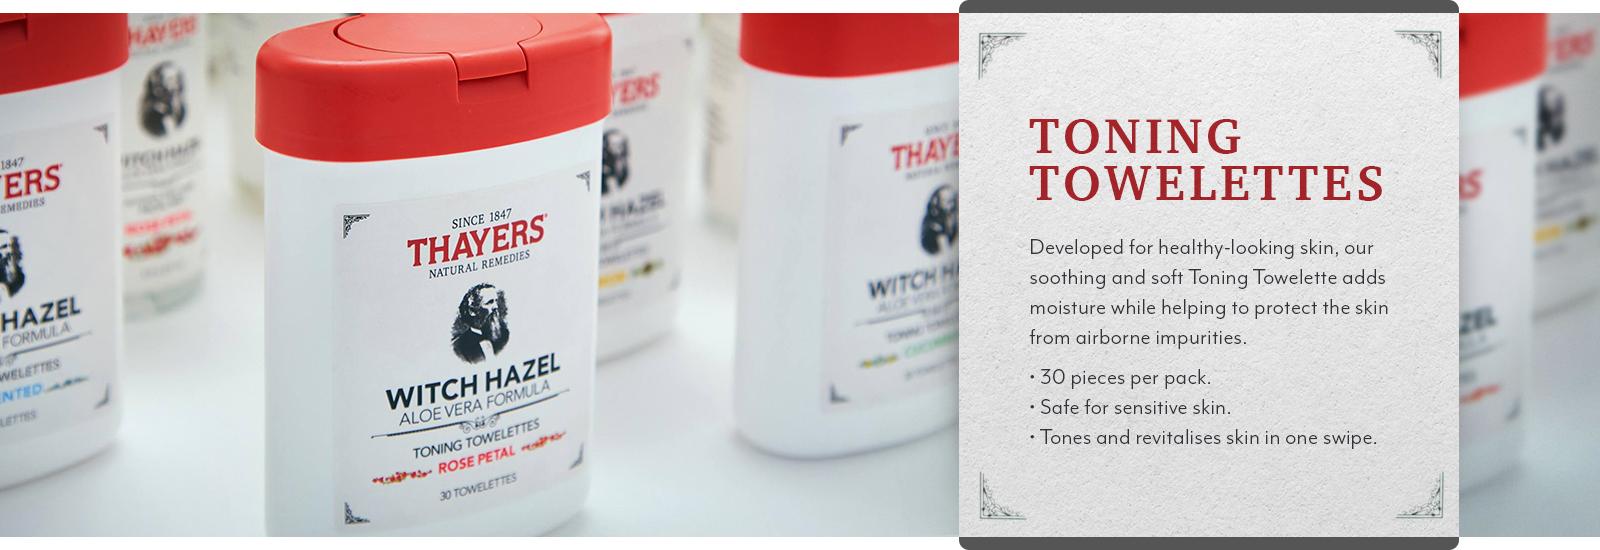 Thayers Toning Towelettes